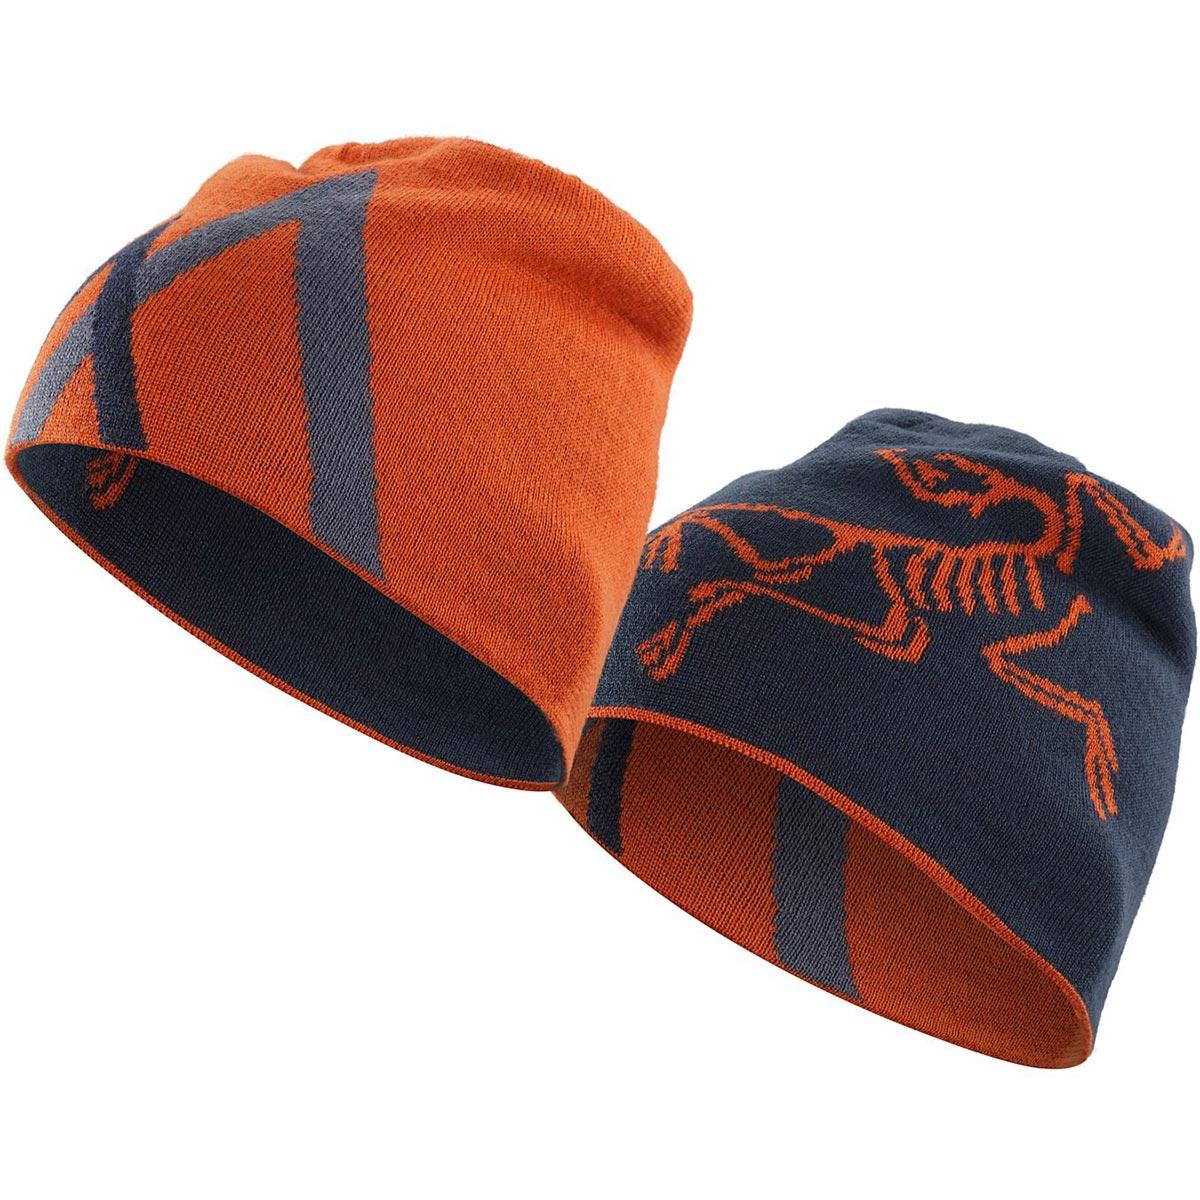 Arc Teryx Arc Mountain Toque Head Gear Clothing